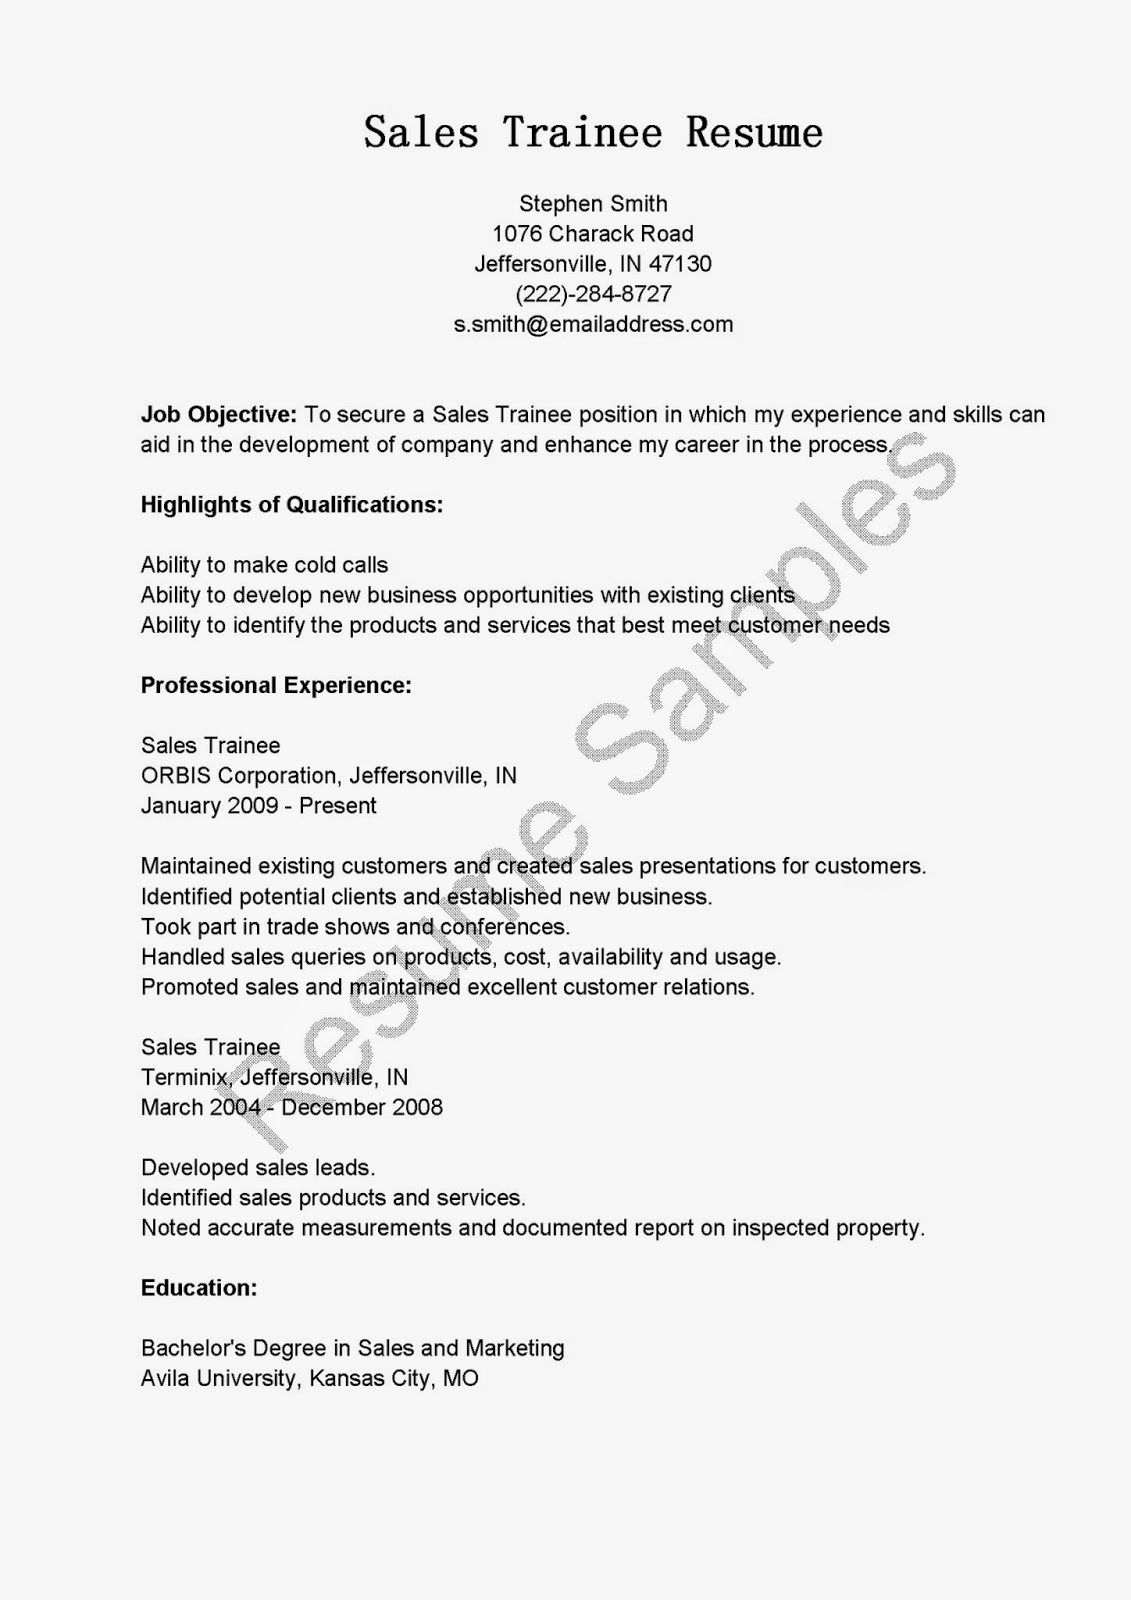 sales trainee resume sample resume samples resame pinterest